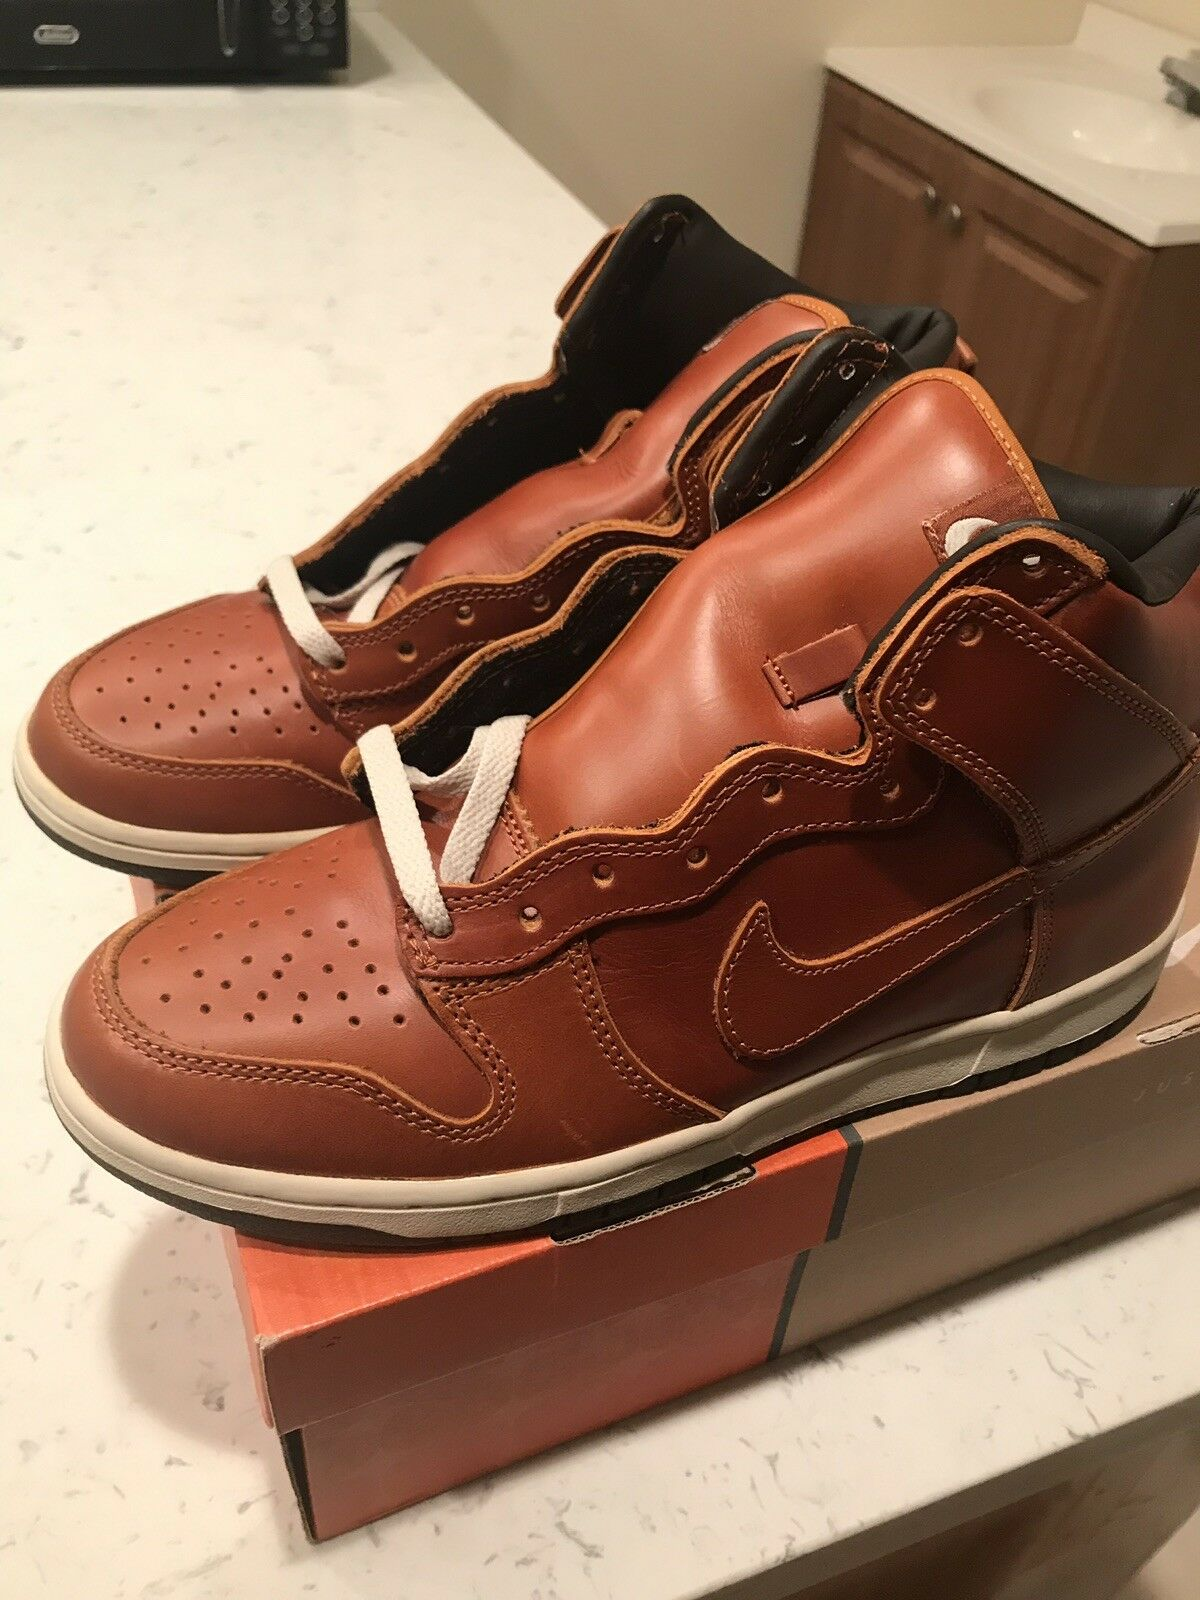 2003 Nike Dunk High Premium Curry Size 9 - Not Co.JP SB Supreme